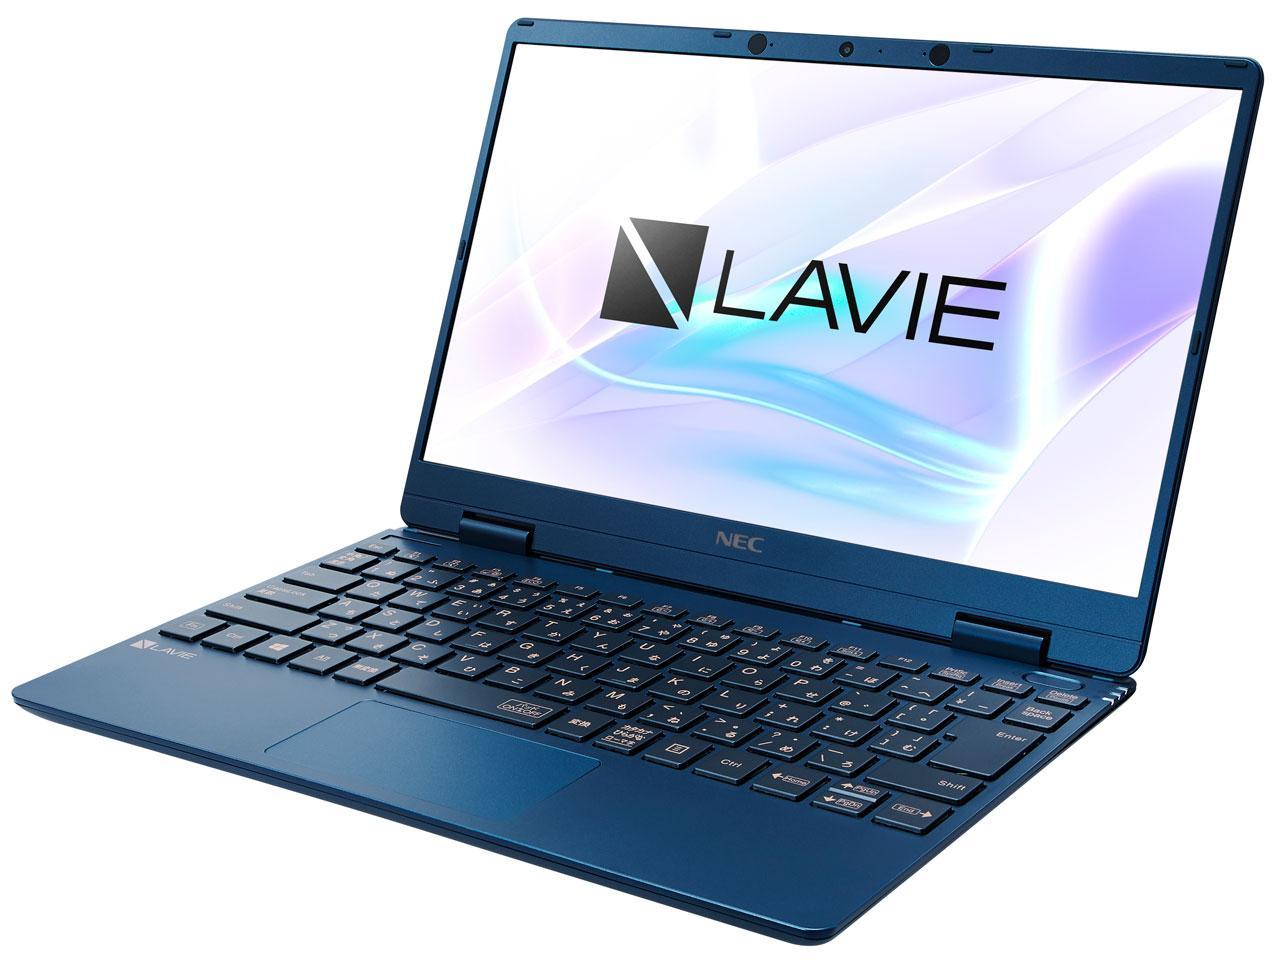 NECパーソナル PC-NM550RAL LAVIE Note Mobile - NM550/RAL ネイビーブルー【smtb-s】